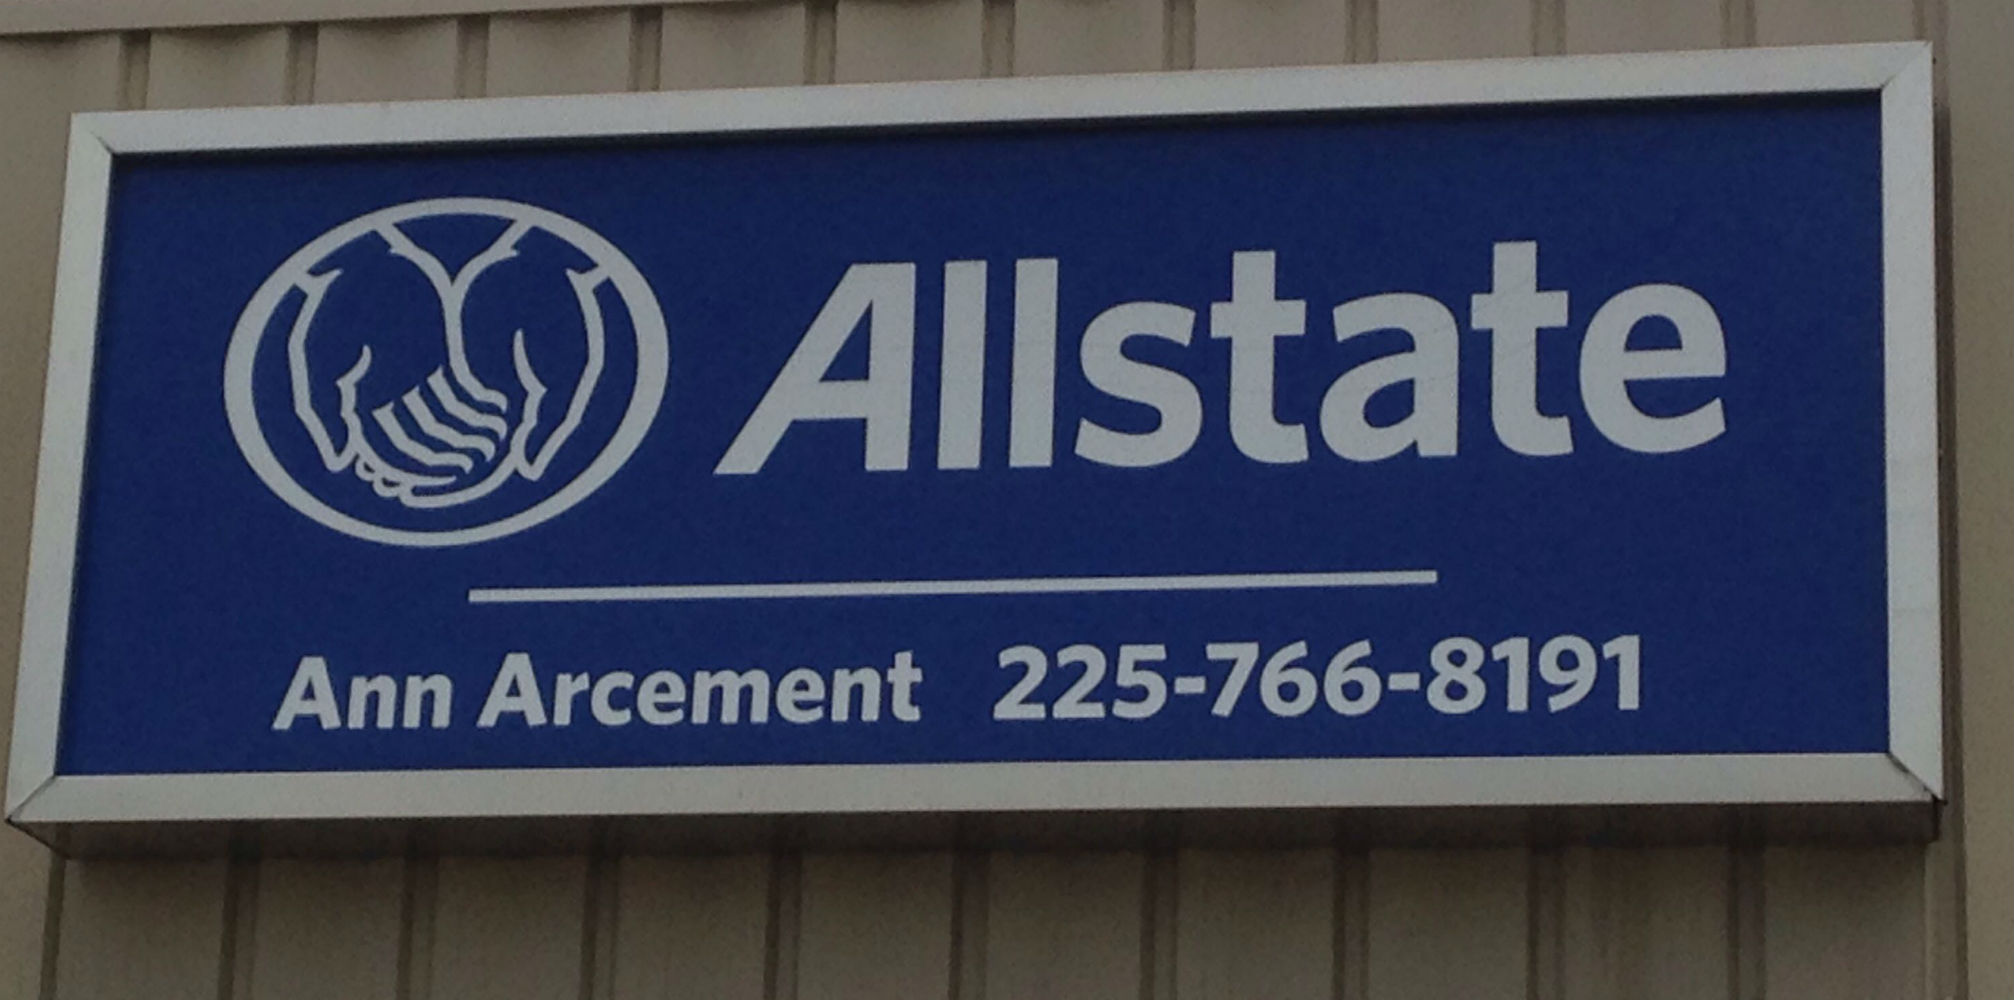 Ann Arcement: Allstate Insurance image 4